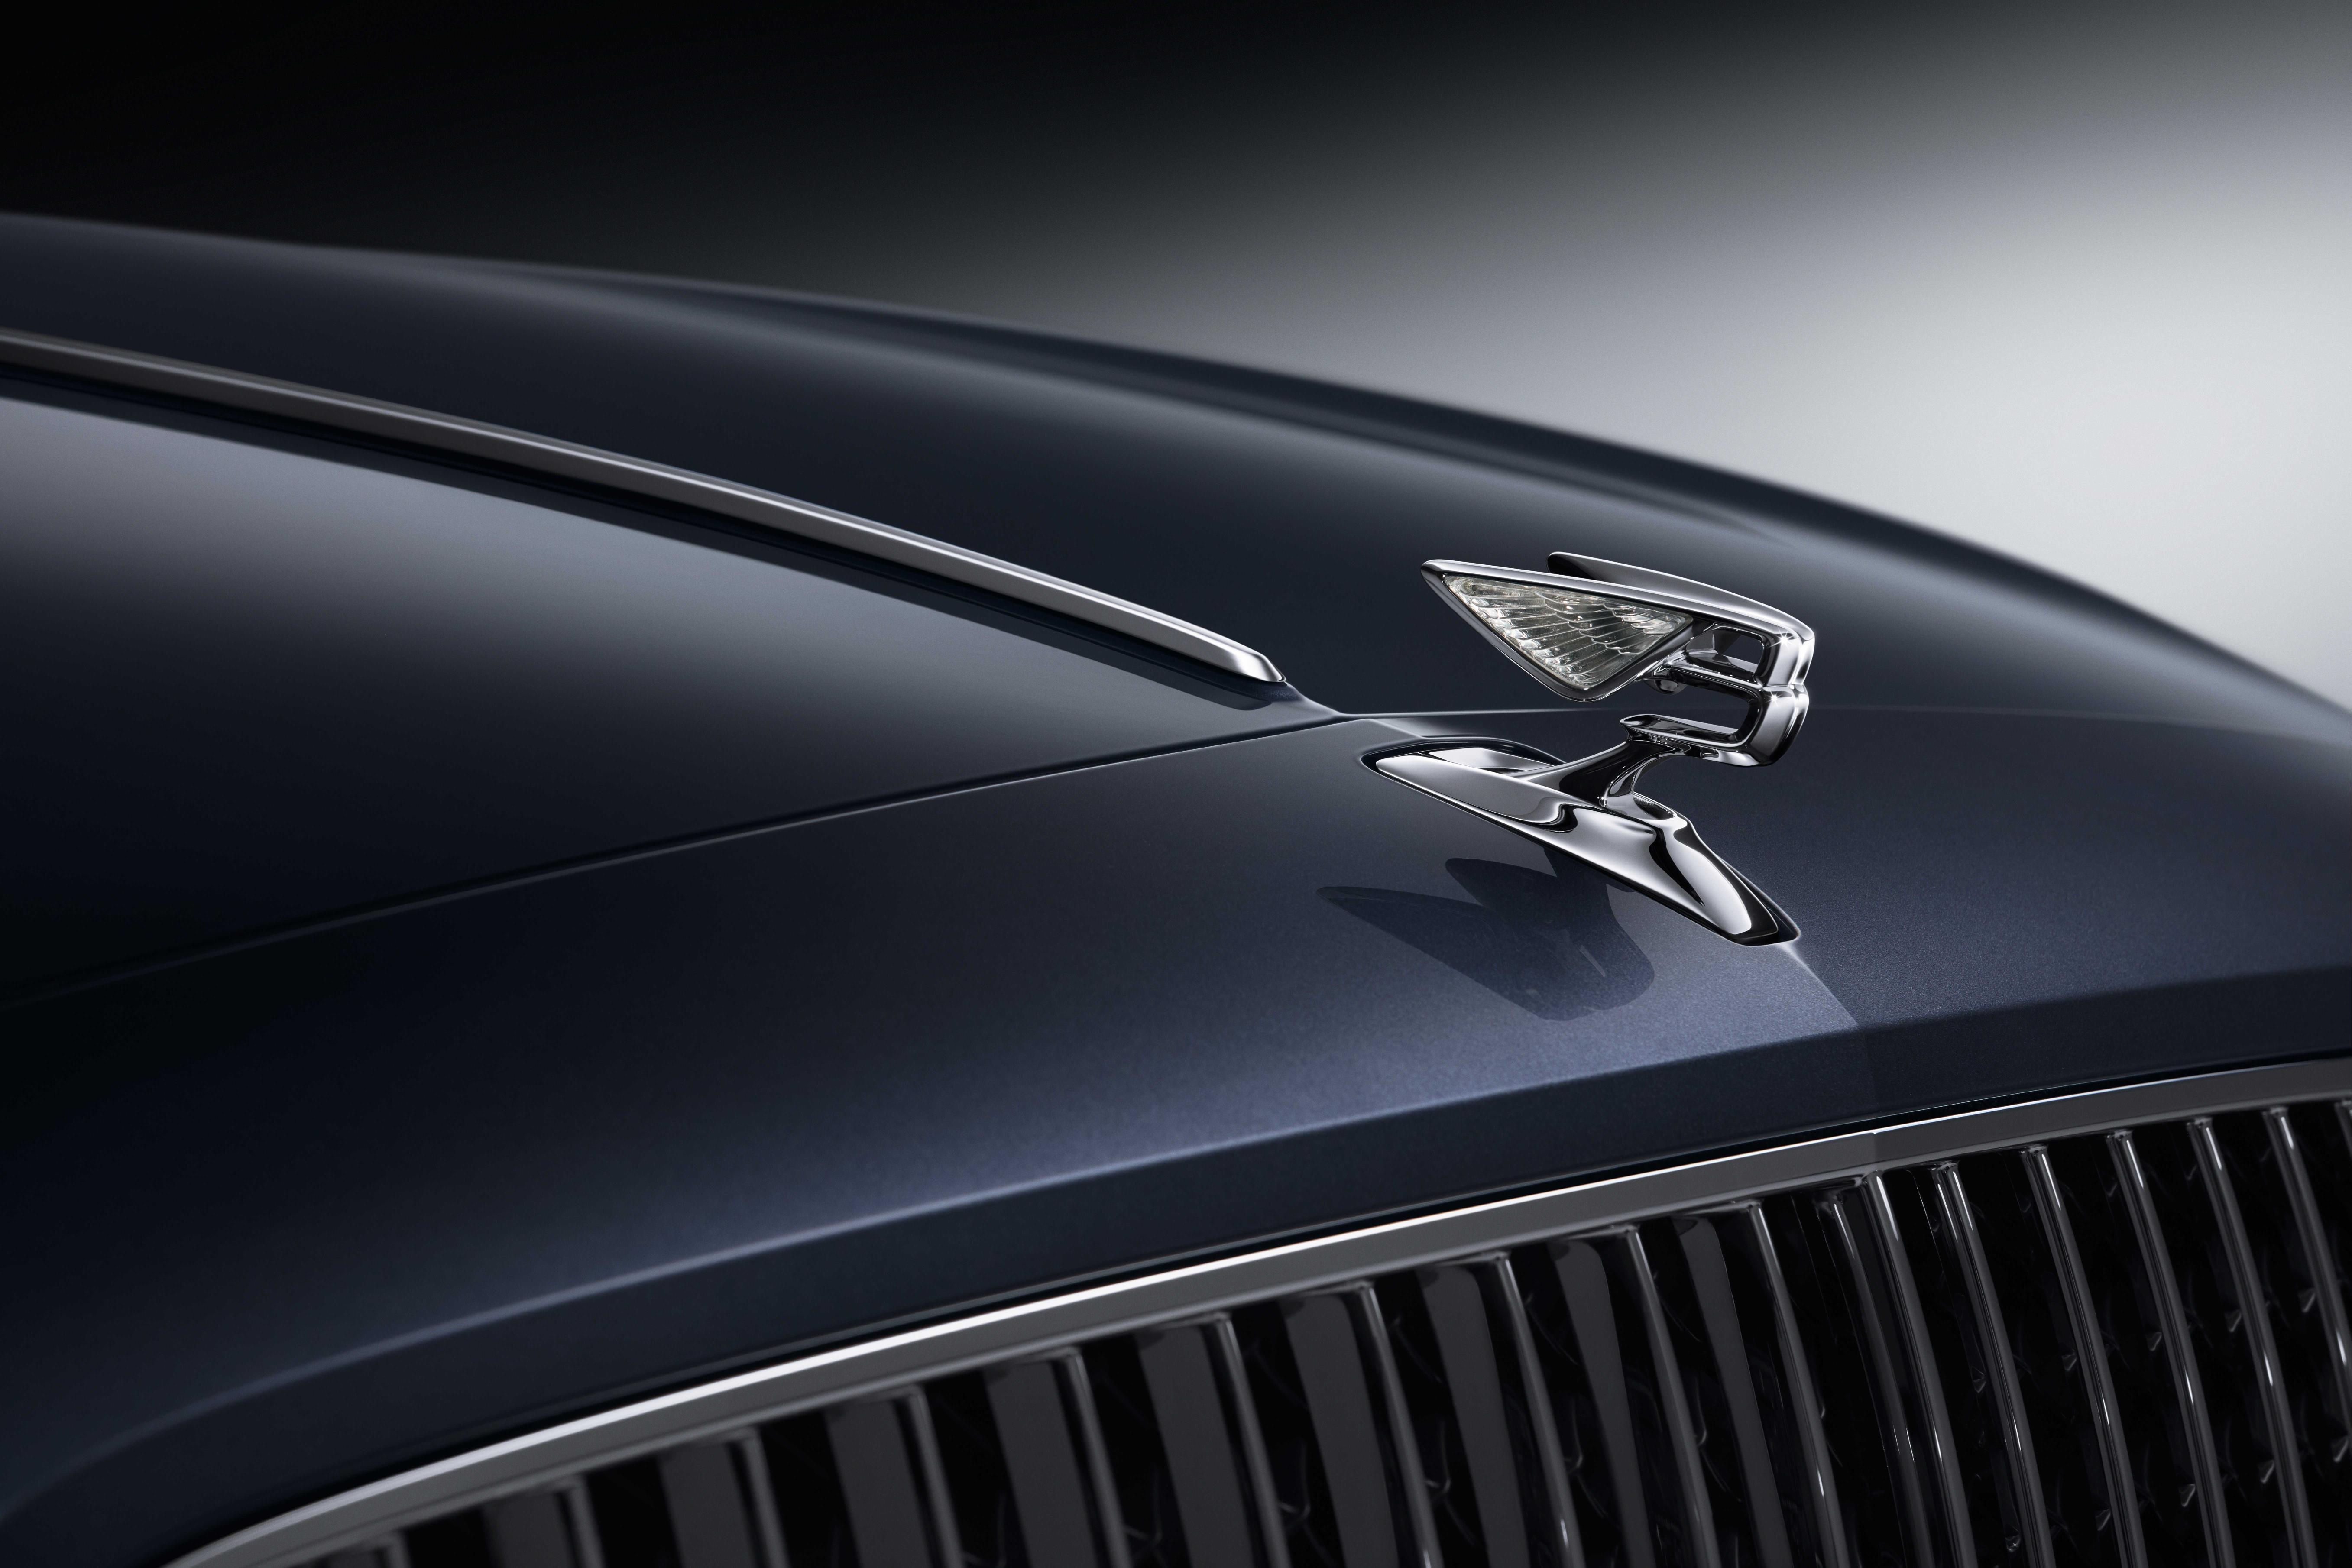 2020 Bentley Flying Spur Flying B Mascot